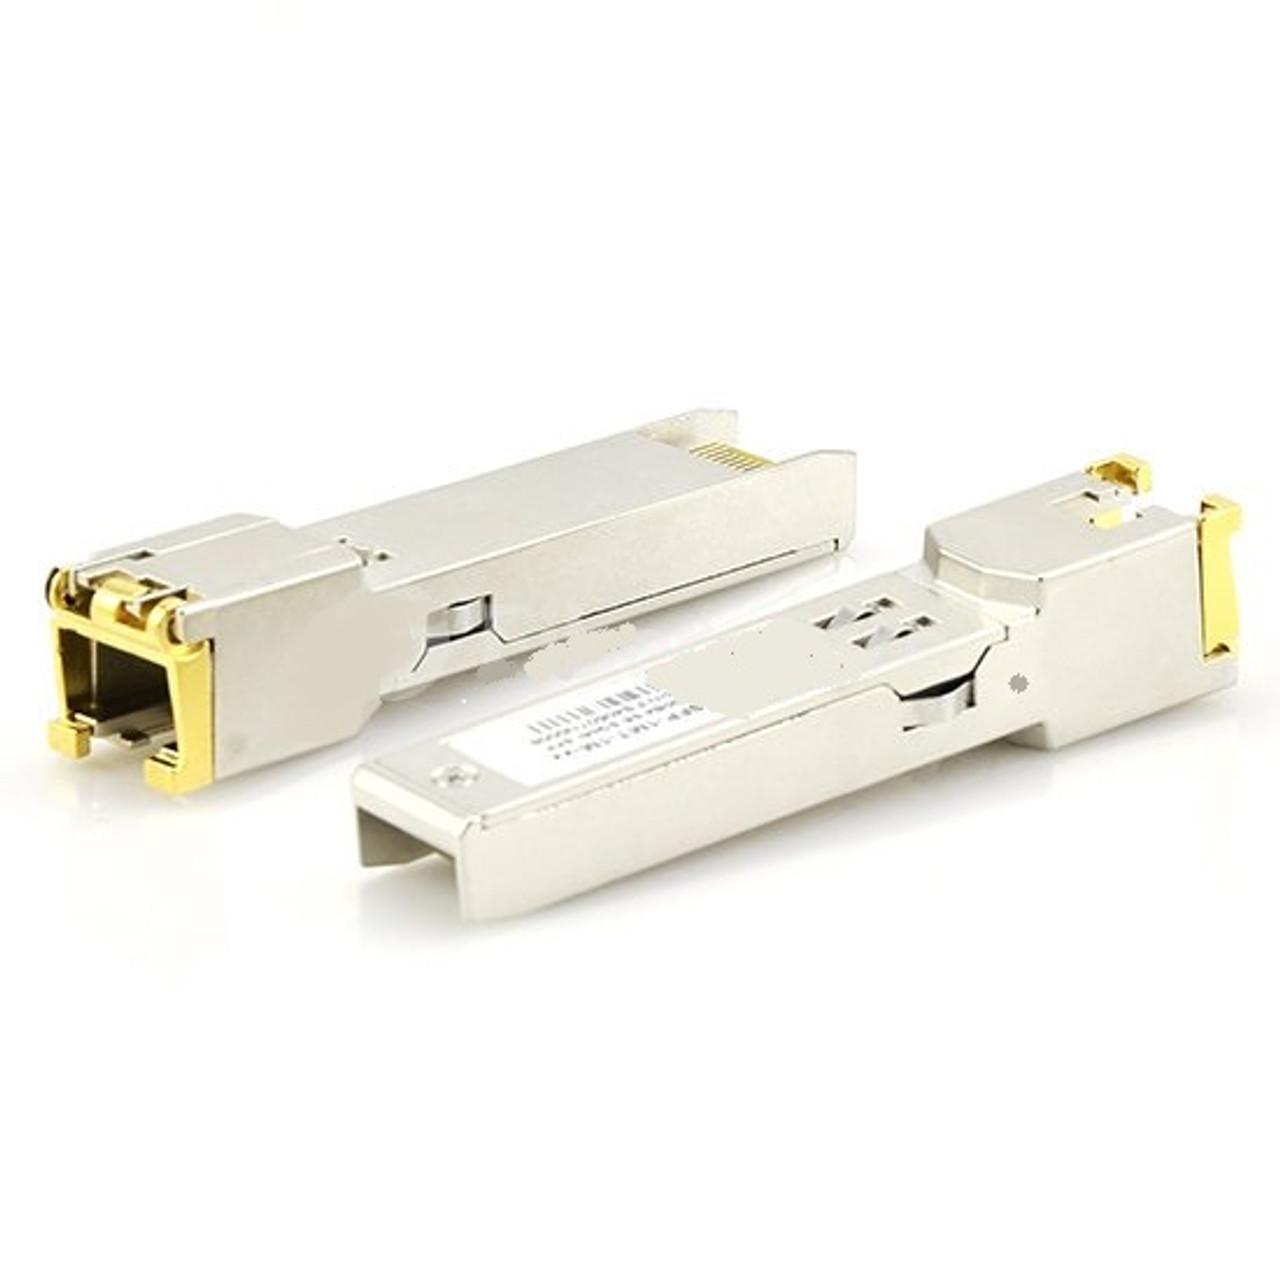 RJ-45 GLC-T 100m Compatible with Cisco 1000BASE-T SFP